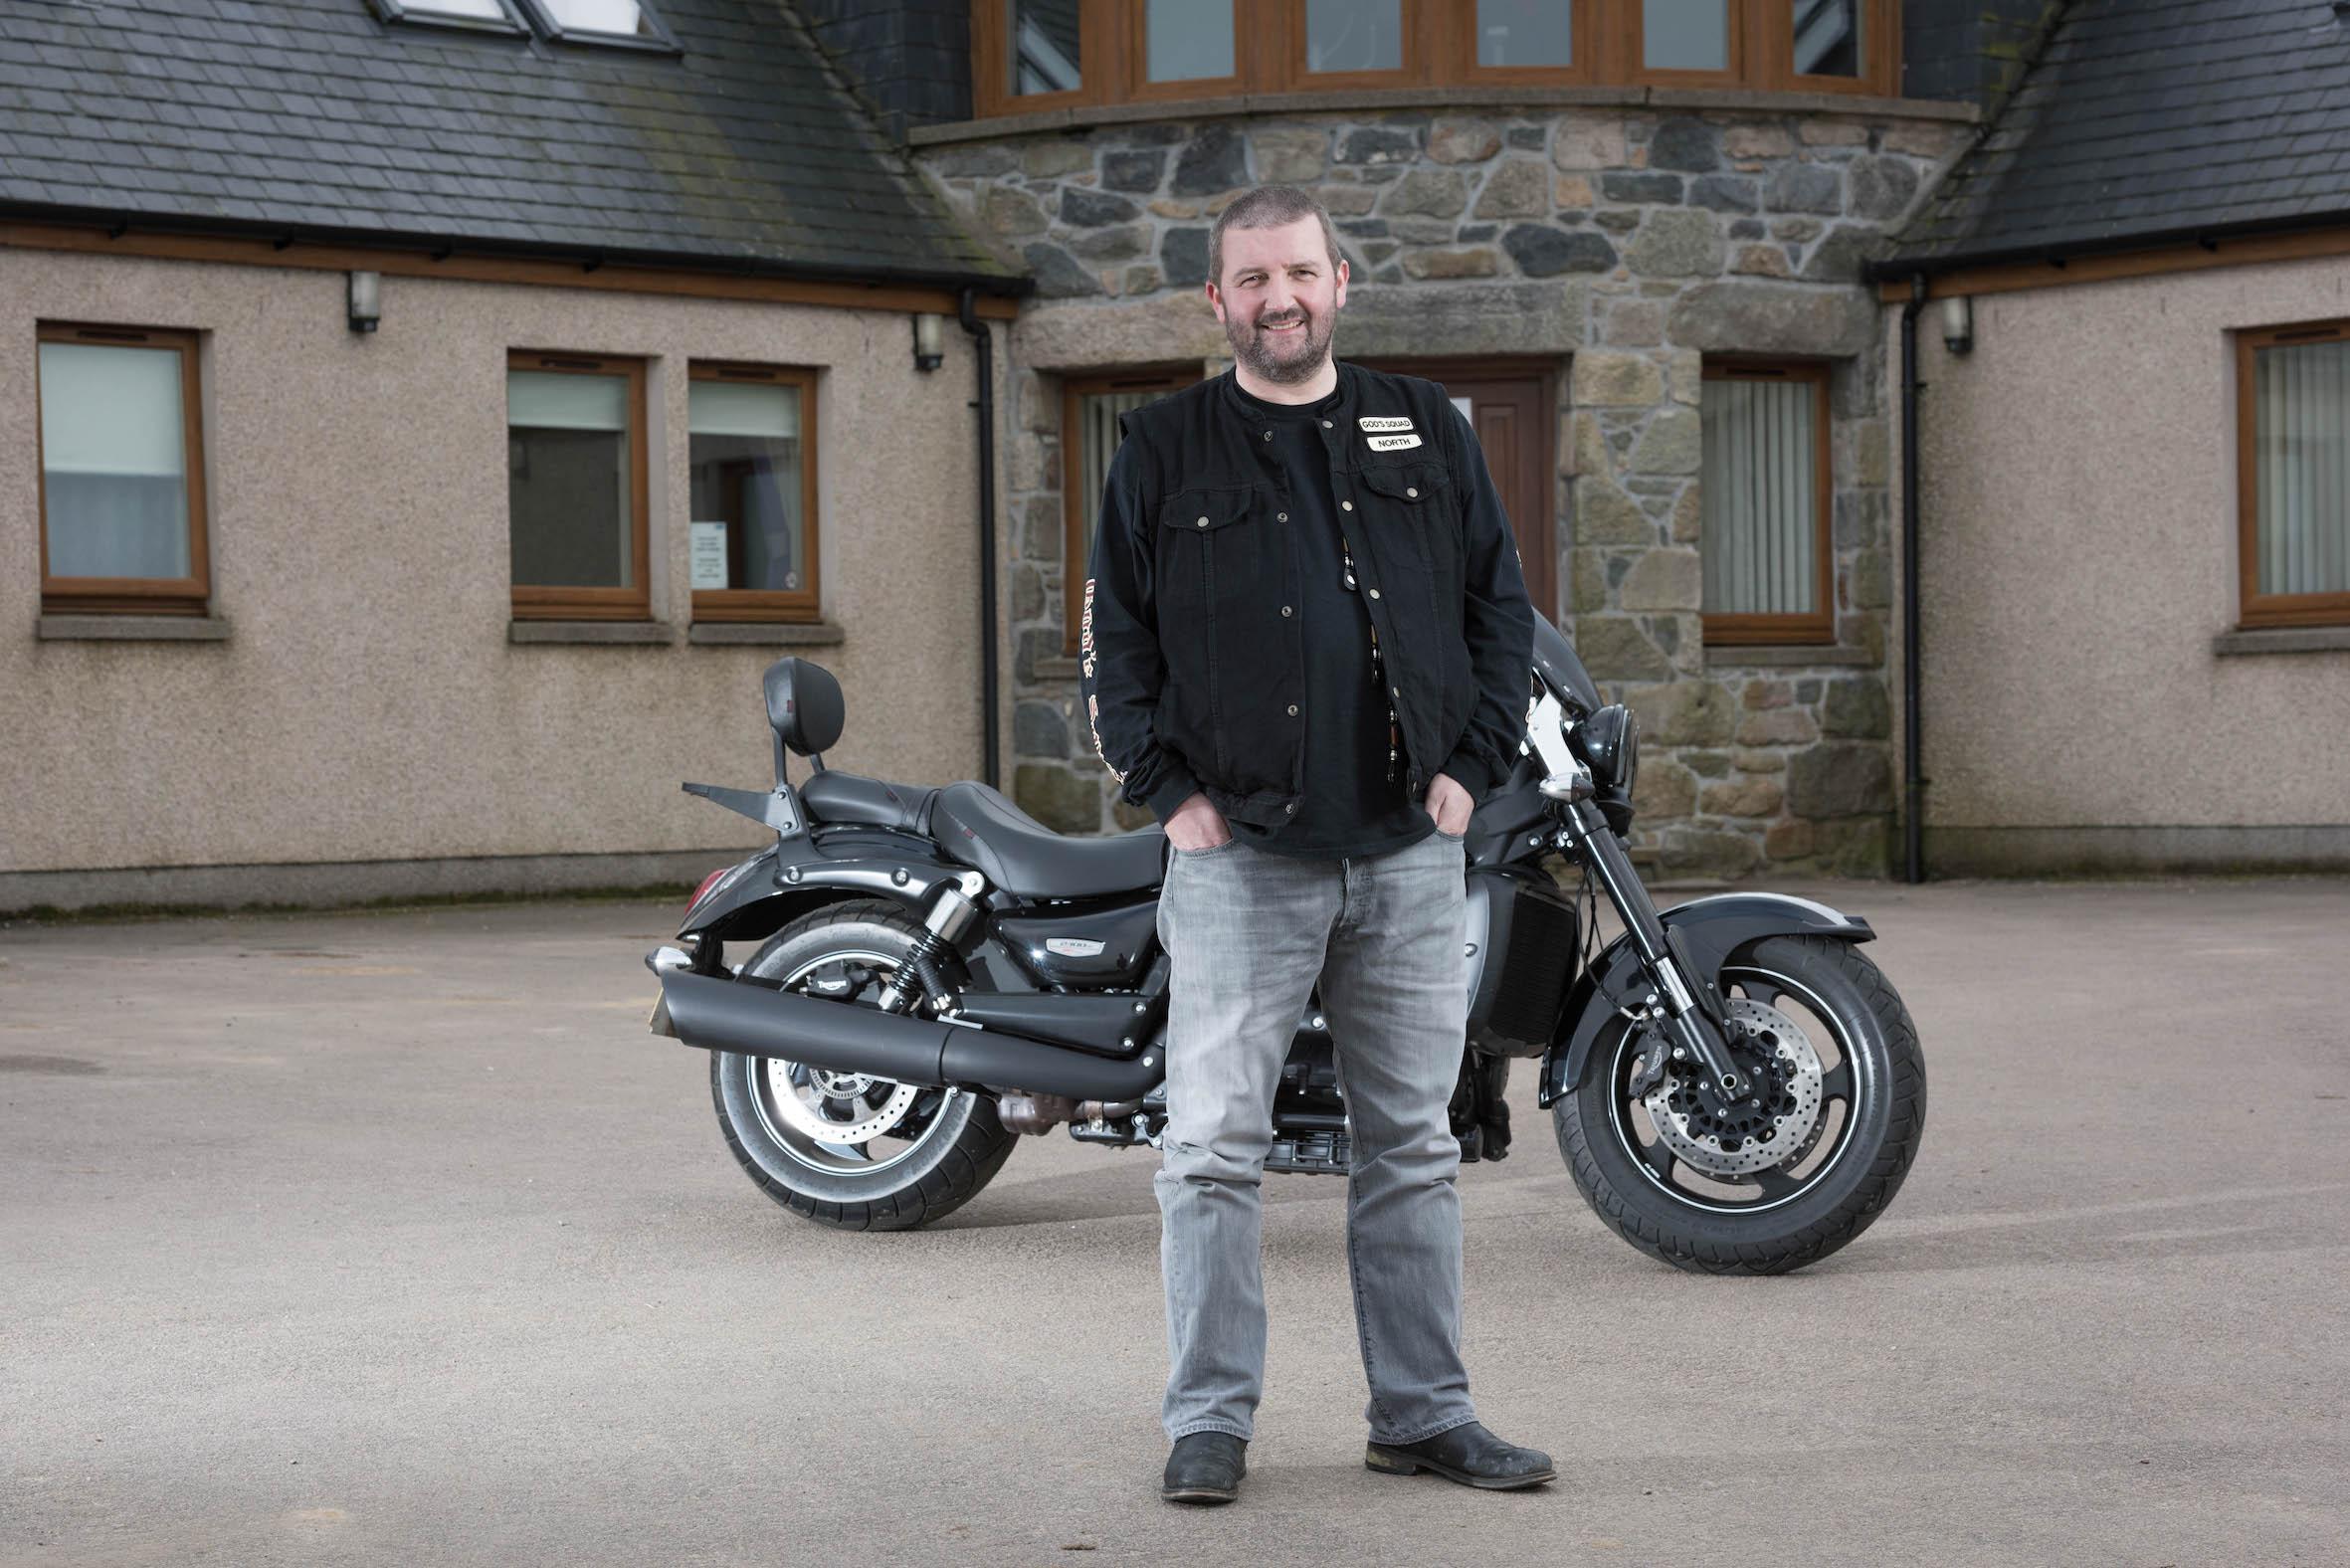 Gordon Cruden with his own bike.